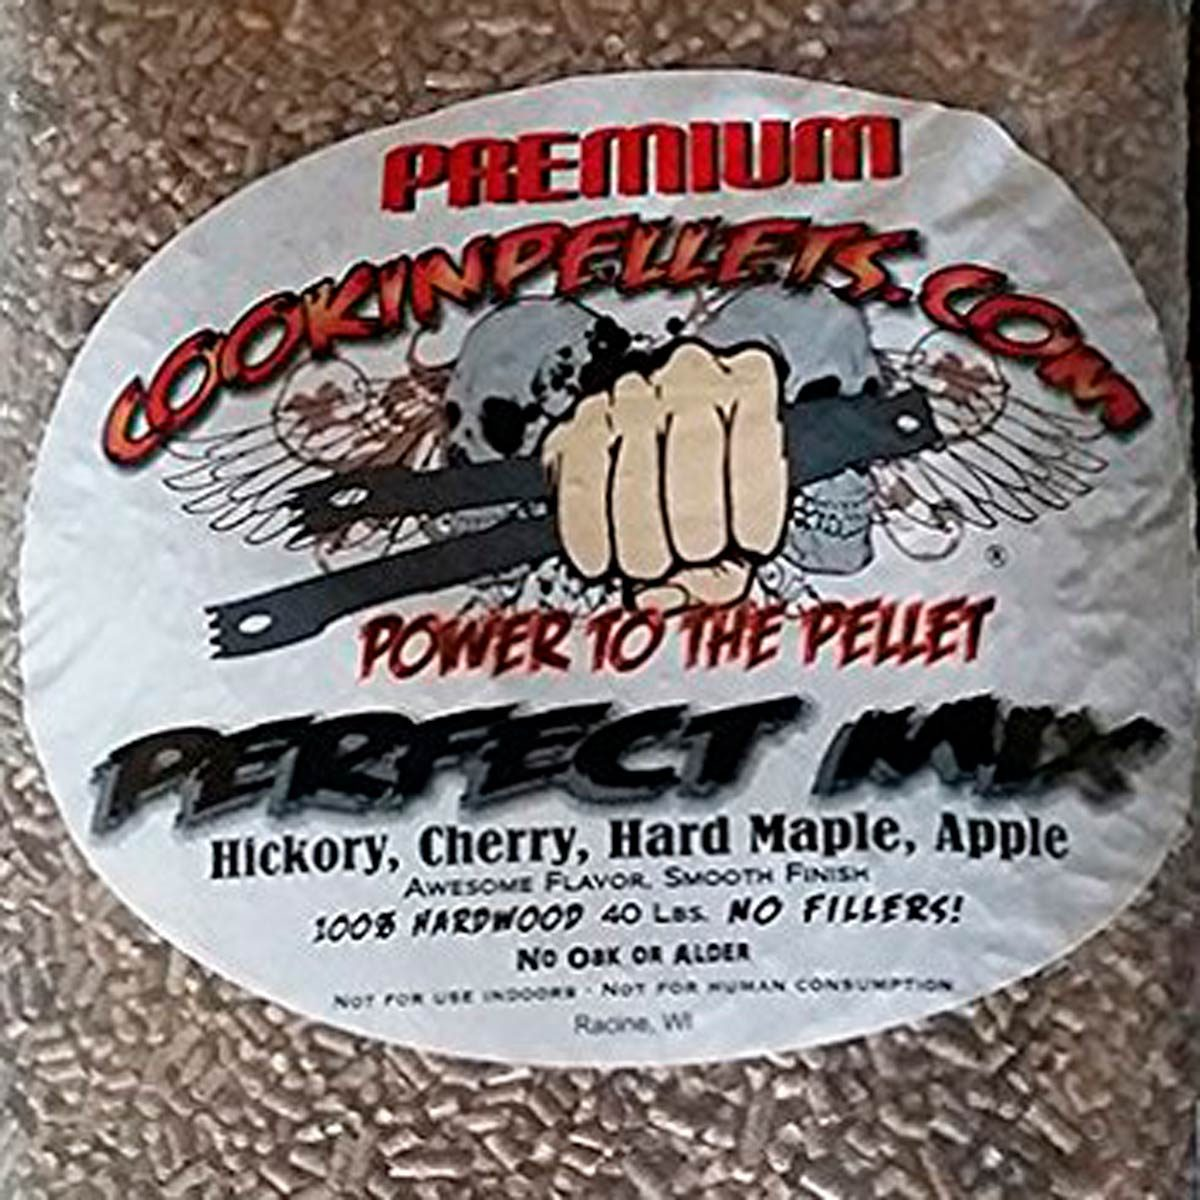 CookinPellets Perfect Mix Smoking Pellets